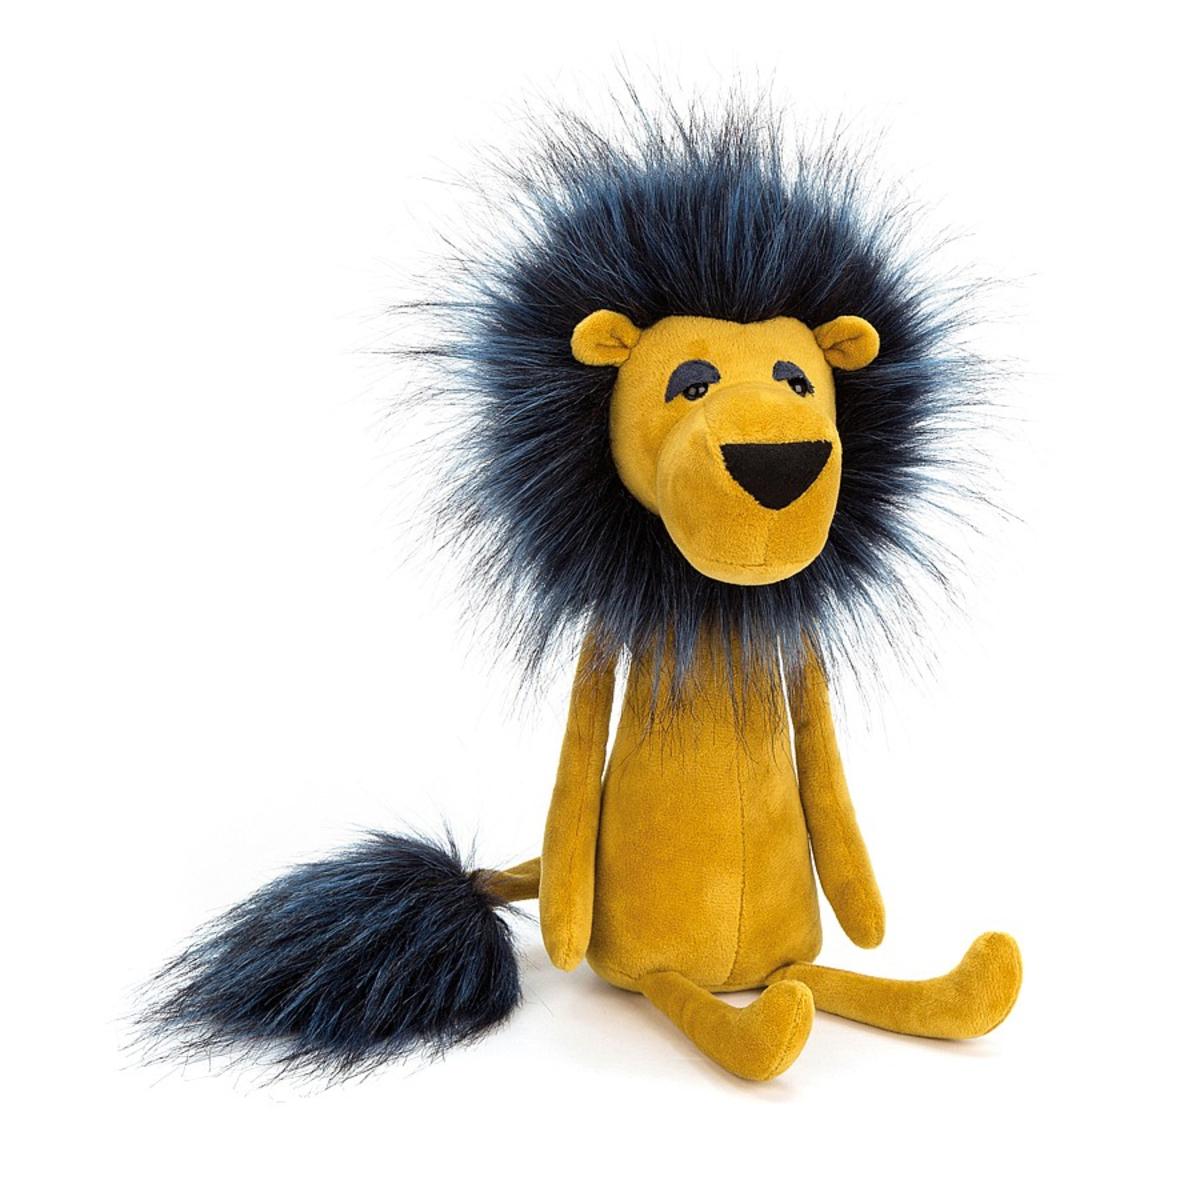 Peluche Swellegant Lancelot Lion Swellegant Lancelot Lion